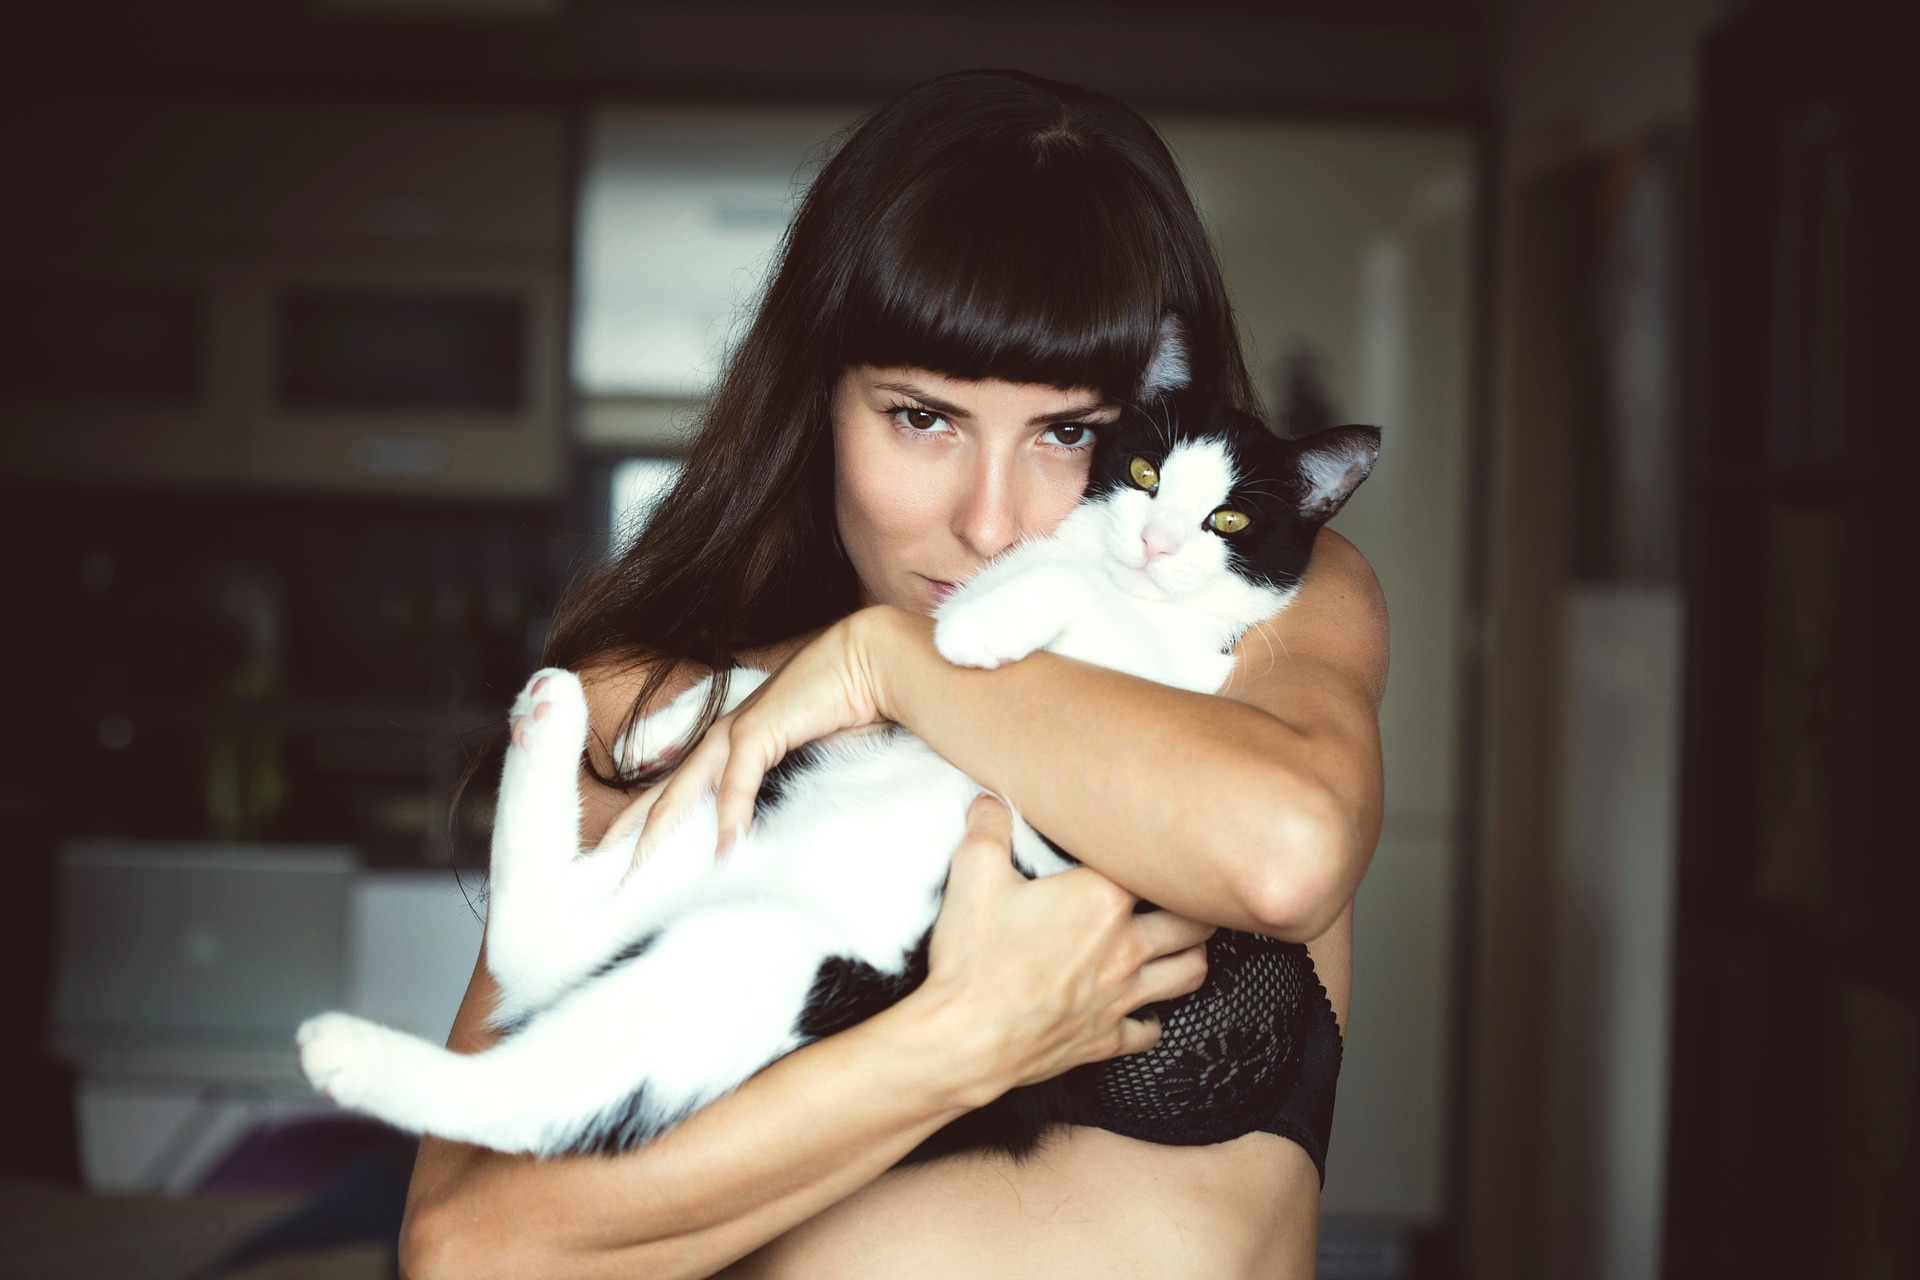 Ai gatti piace essere abbracciati? Guida pratica alle coccole